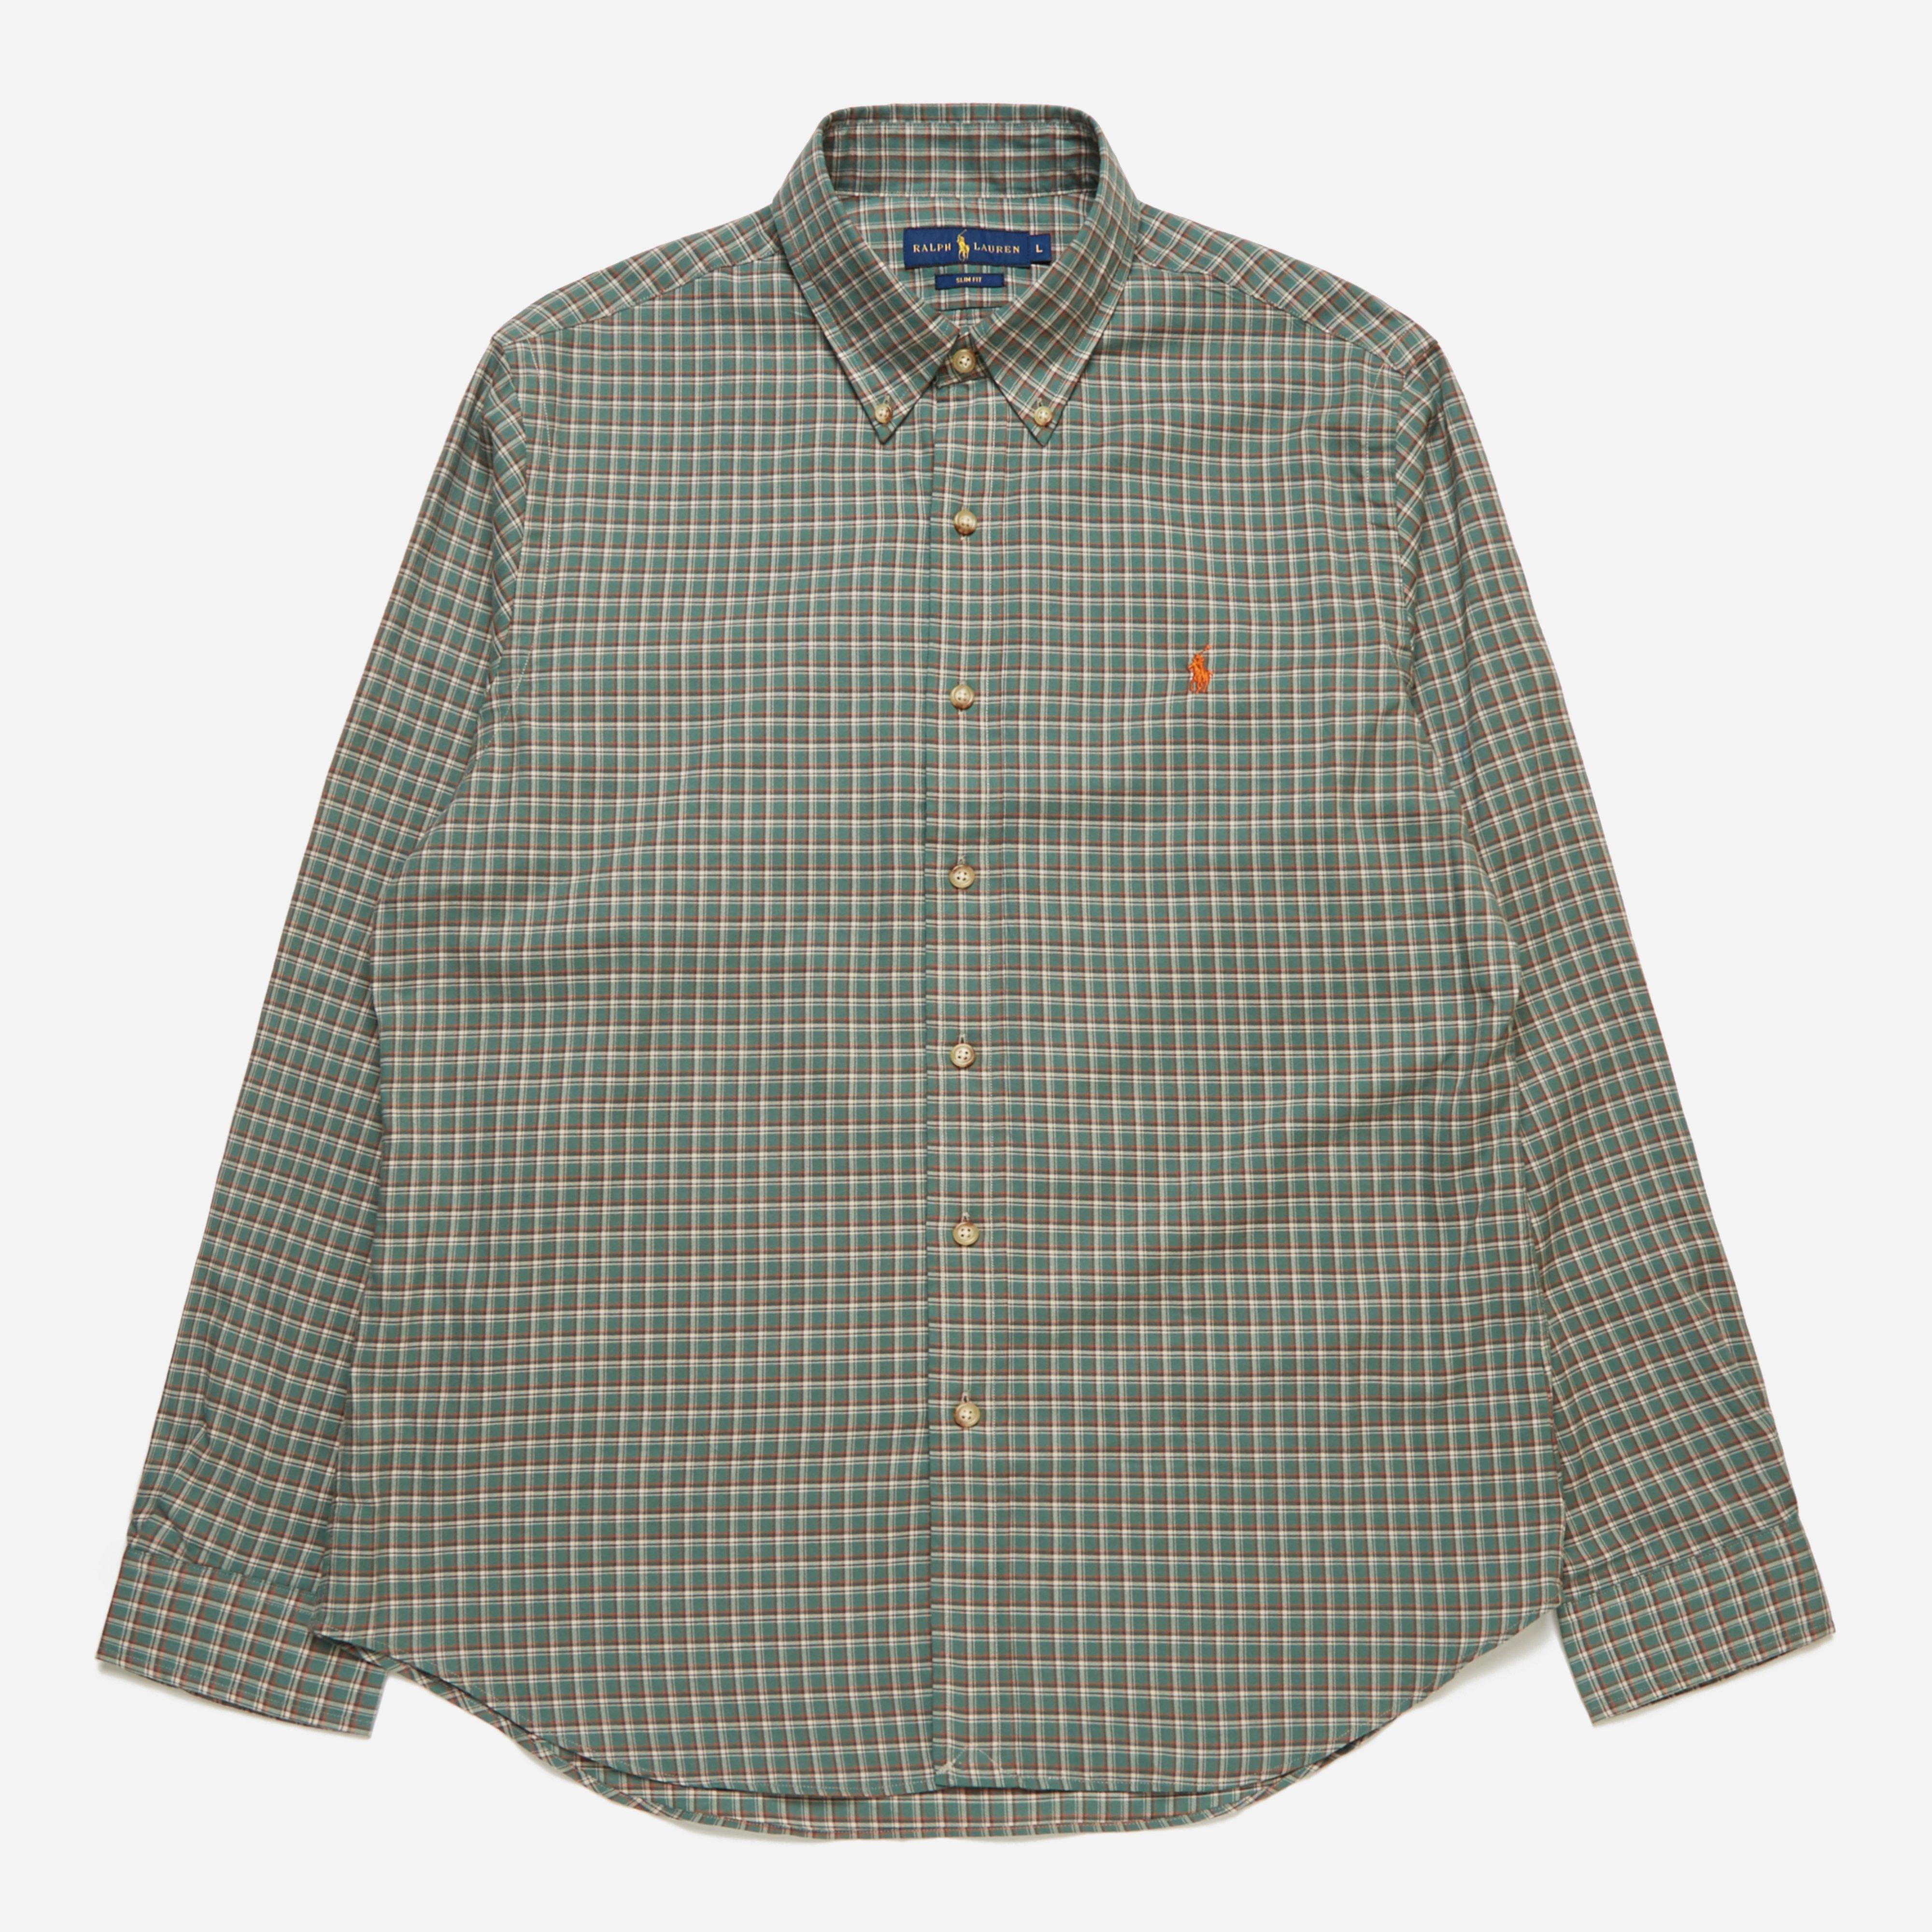 Polo Ralph Lauren Slim Fit Oxford Shirt